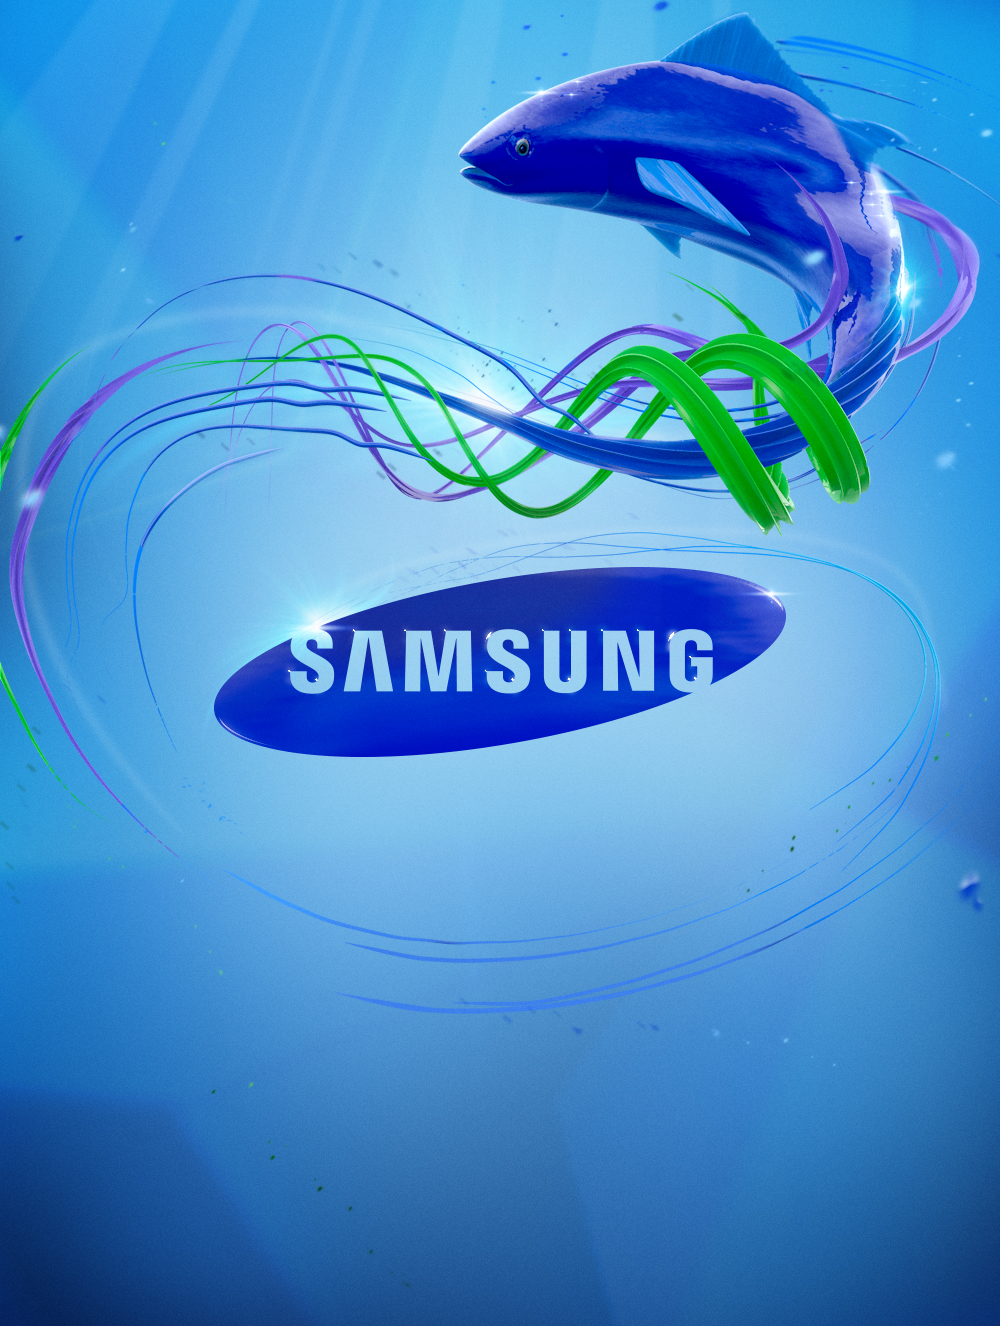 Samsung_water_001_v02